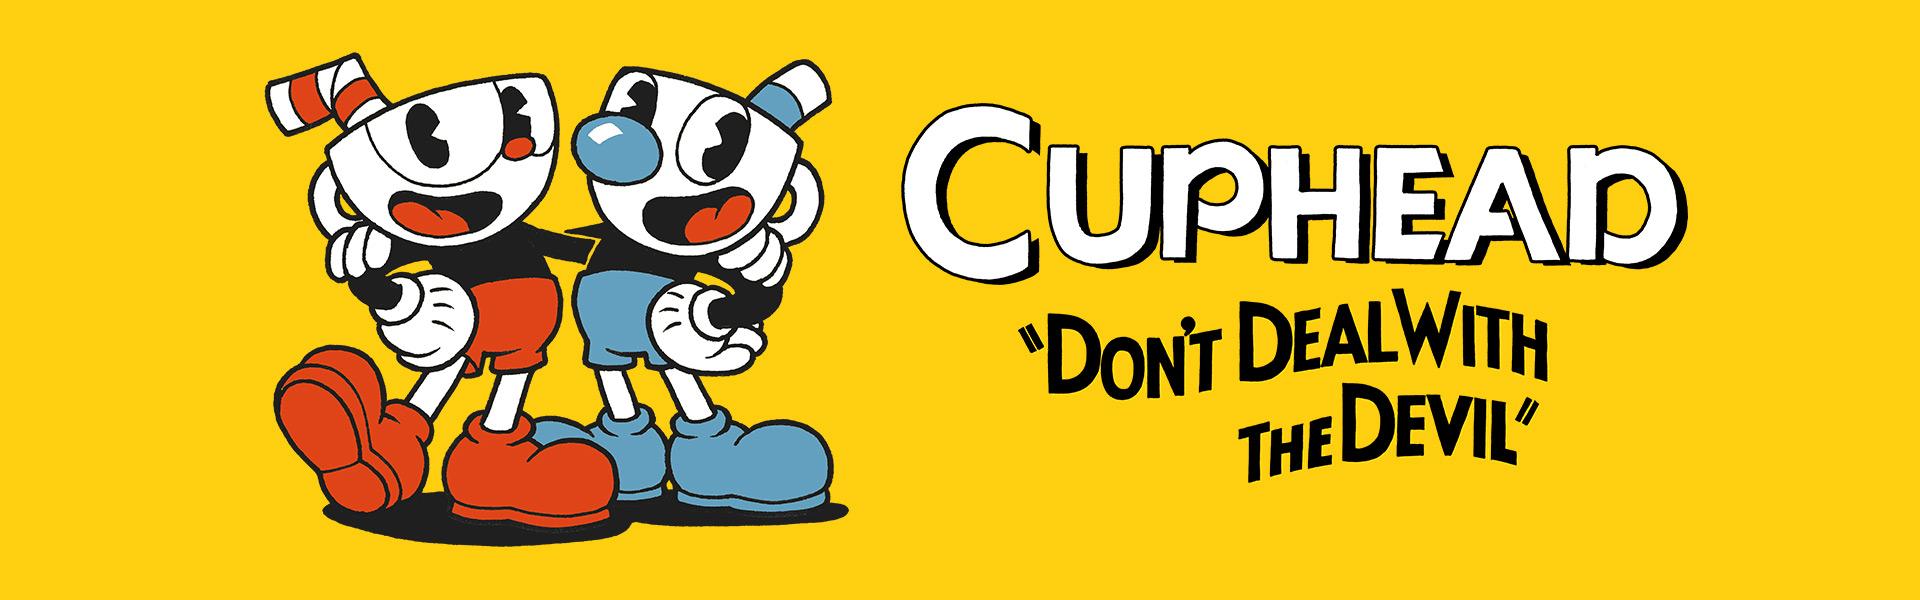 cuphead come